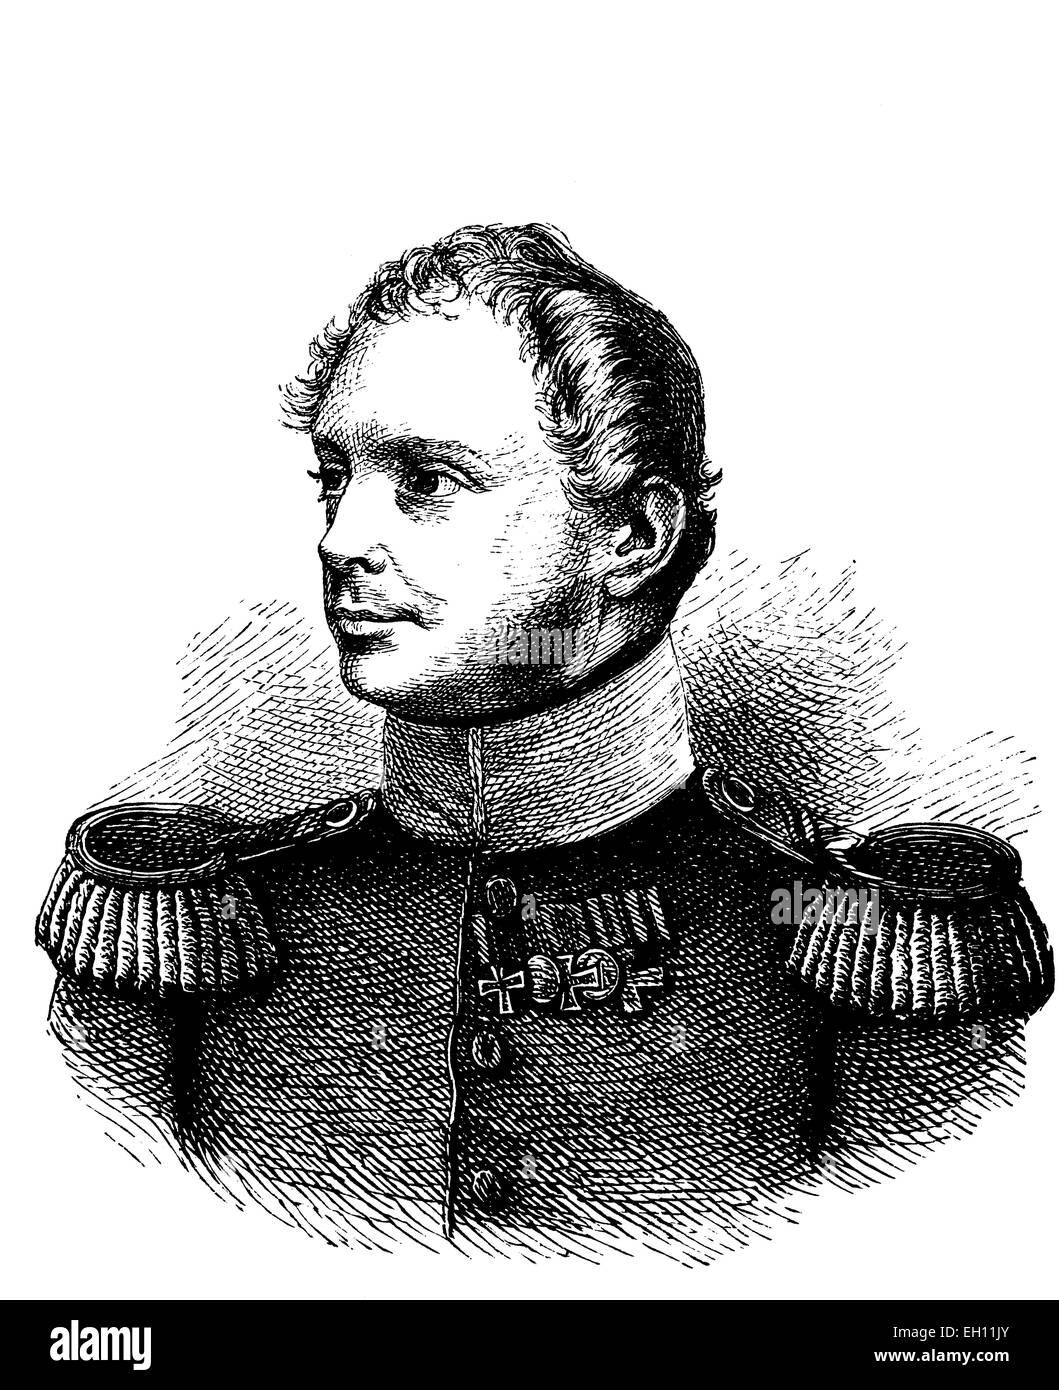 Friedrich Wilhelm IV, 1795-1861, King of Prussia - Stock Image